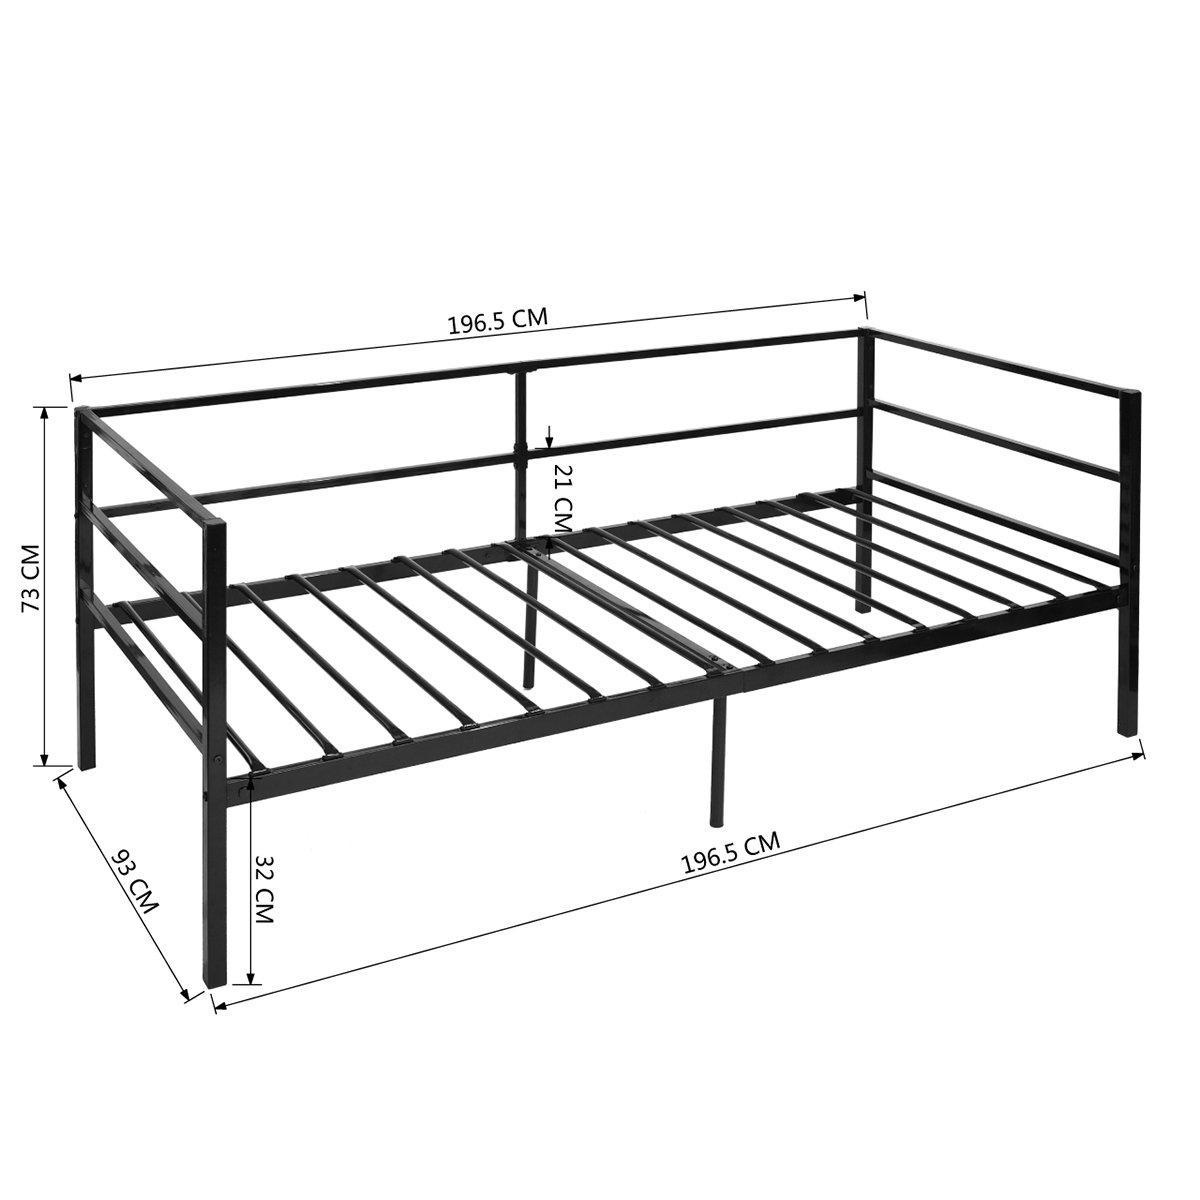 eggree metallbett hofmann bett schlafsofa bettgestell. Black Bedroom Furniture Sets. Home Design Ideas